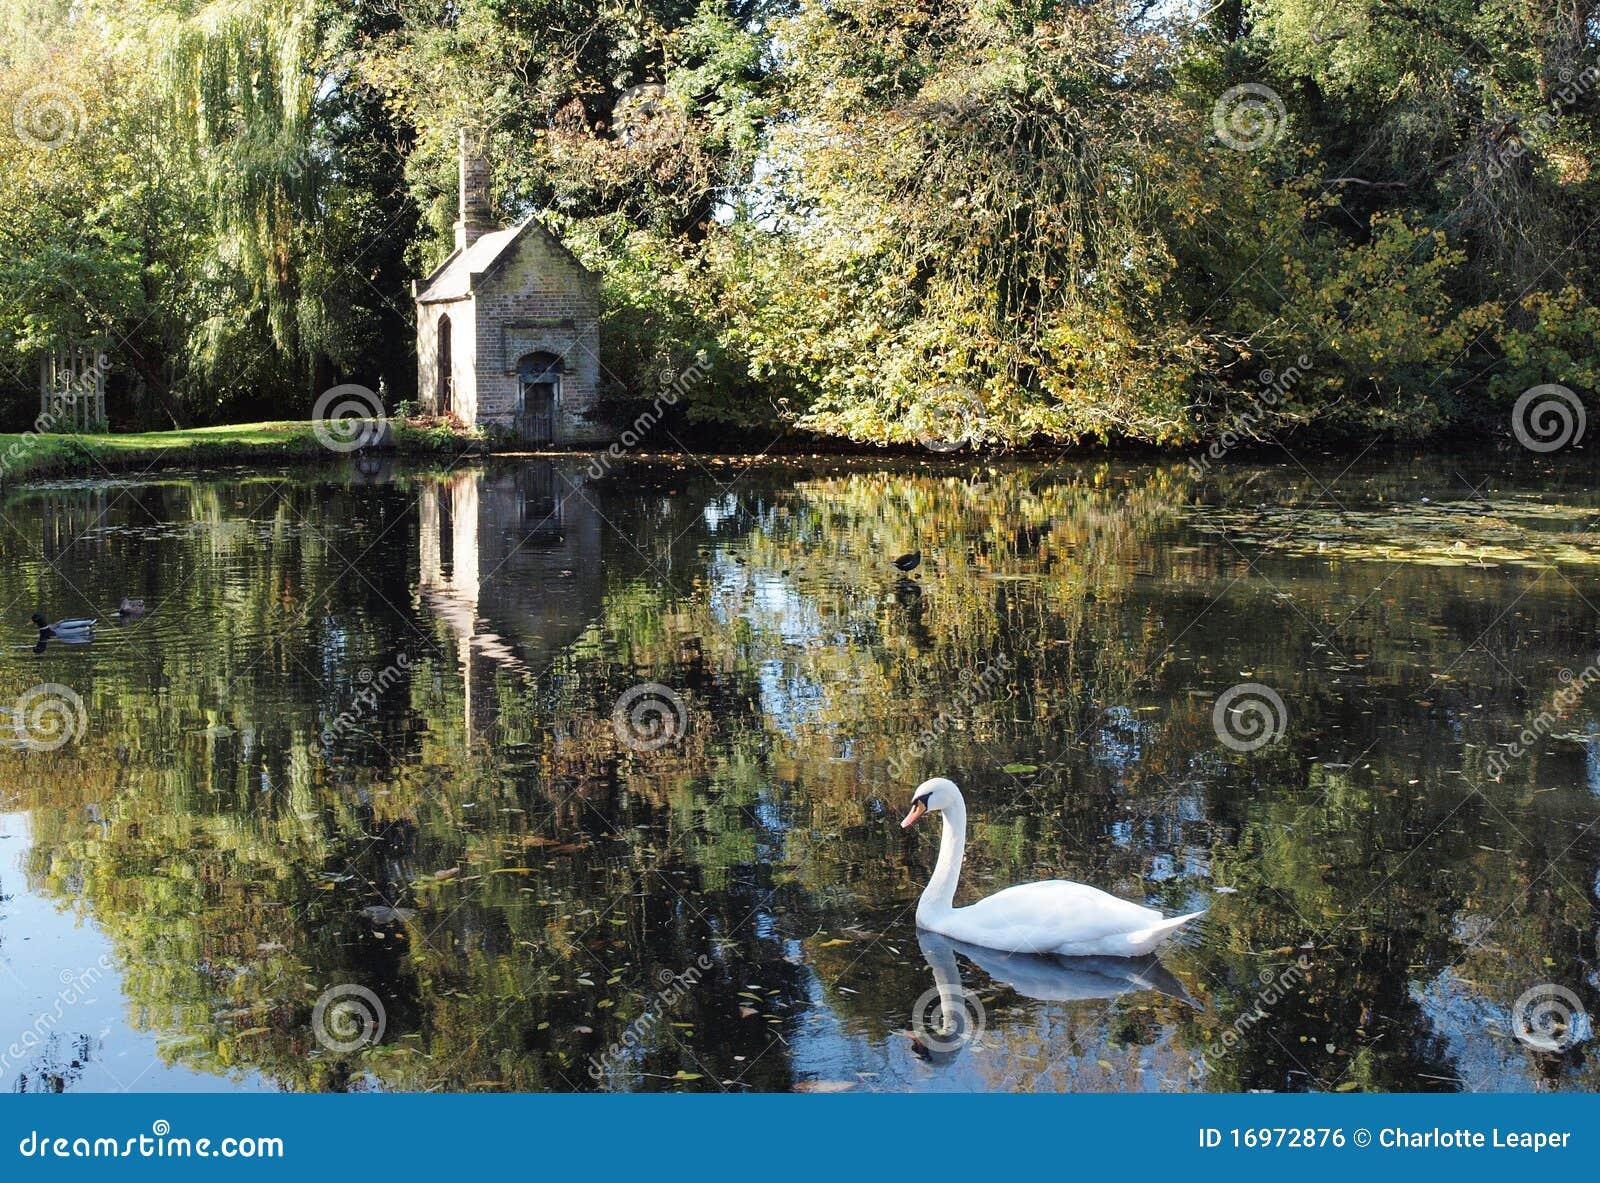 Beautiful Lake Scene With Swan, England Stock Photo - Image of tree, reflection: 16972876